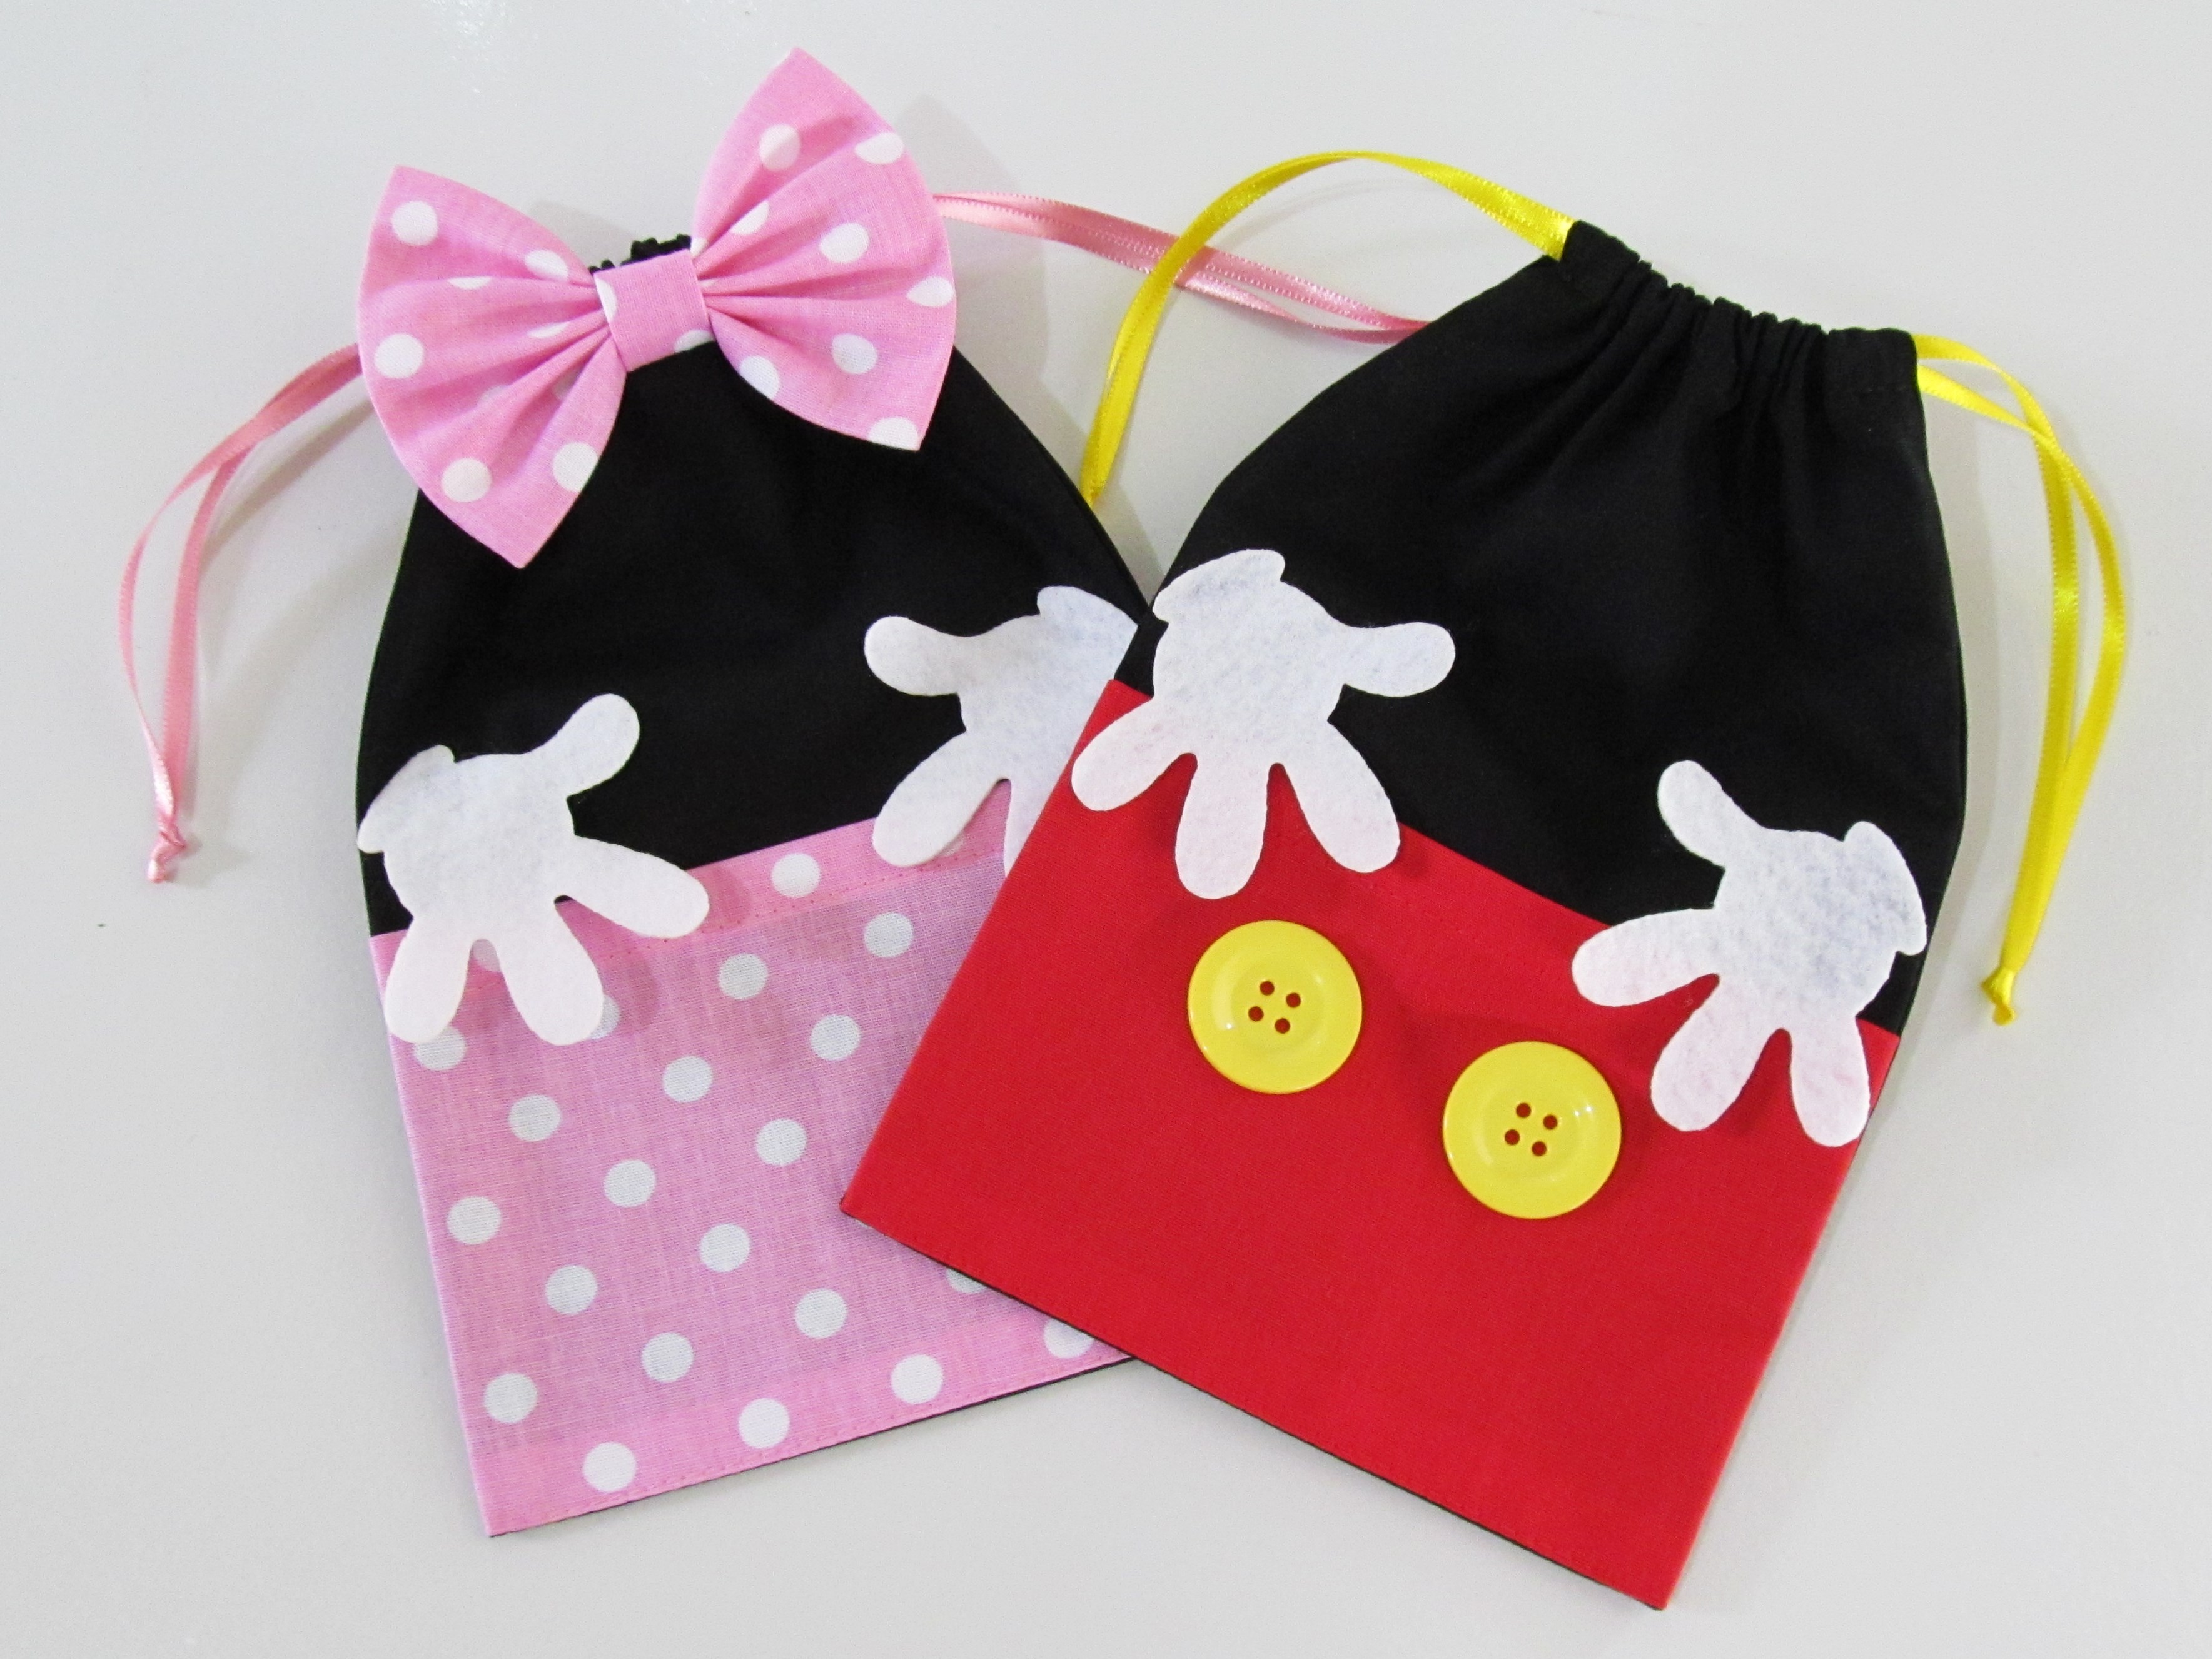 Saquinho Minnie Rosa  13 x 18 cm Saquinho Minnie Rosa  13 x 18 cm